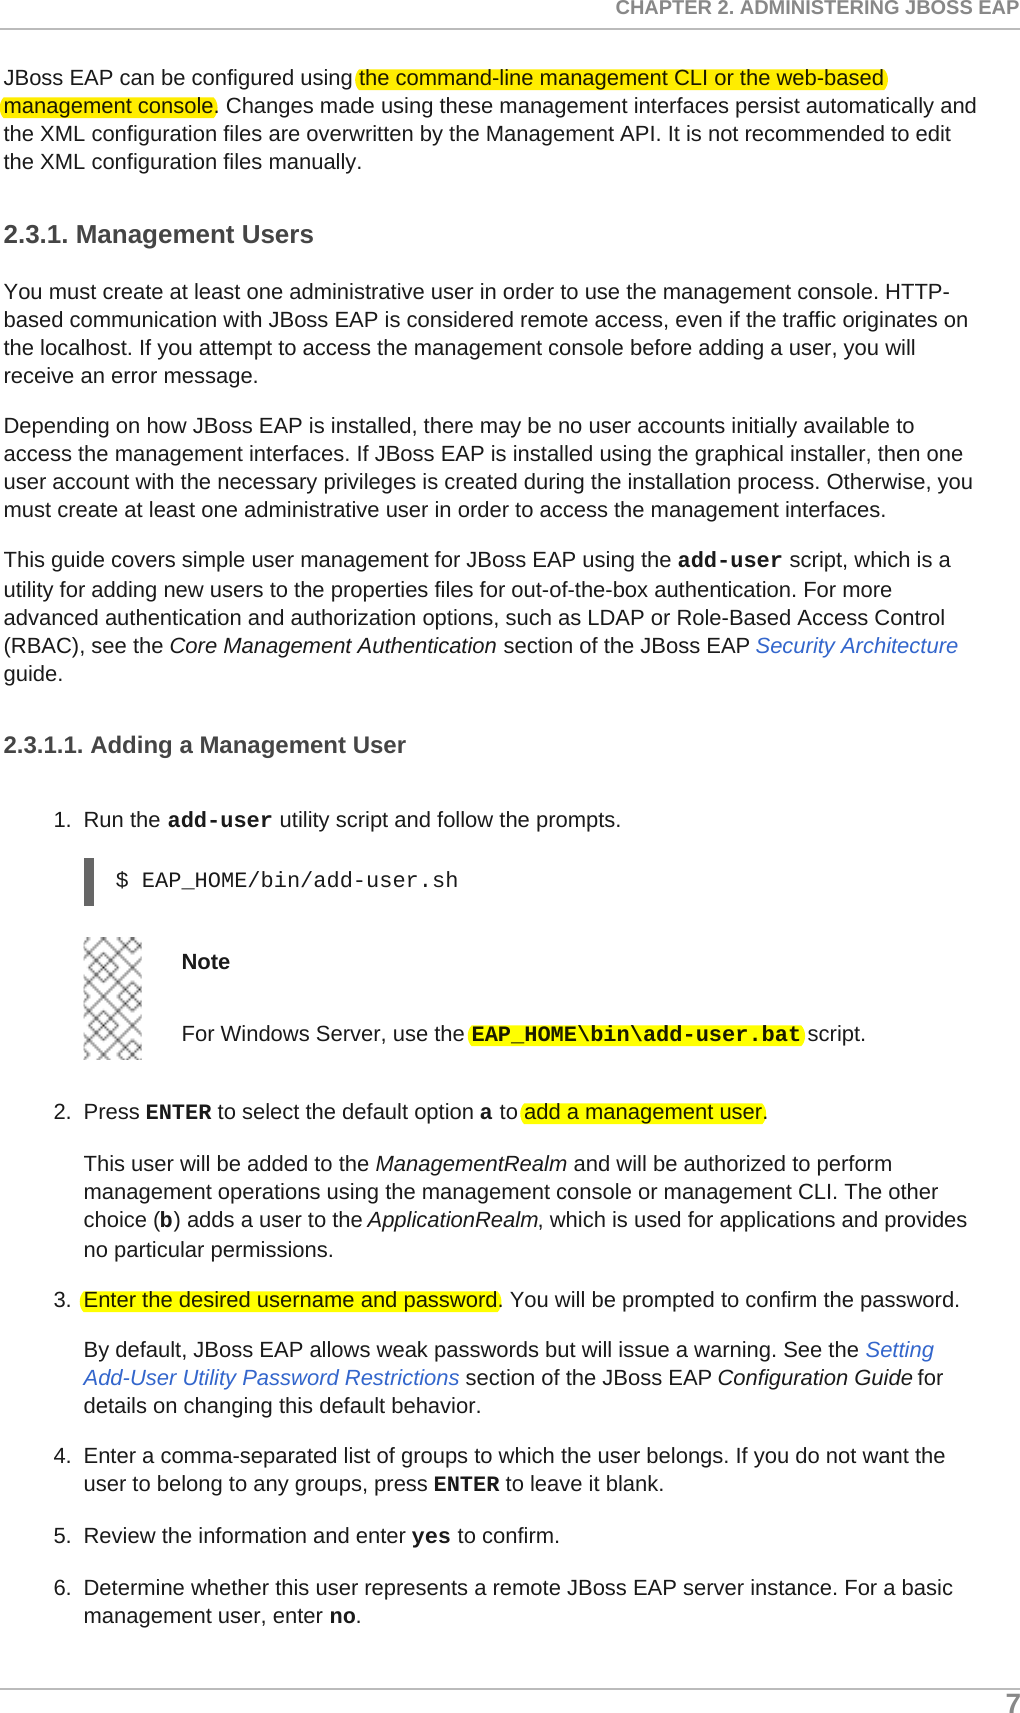 Red Hat JBoss Enterprise Application Platform 7 0 Getting